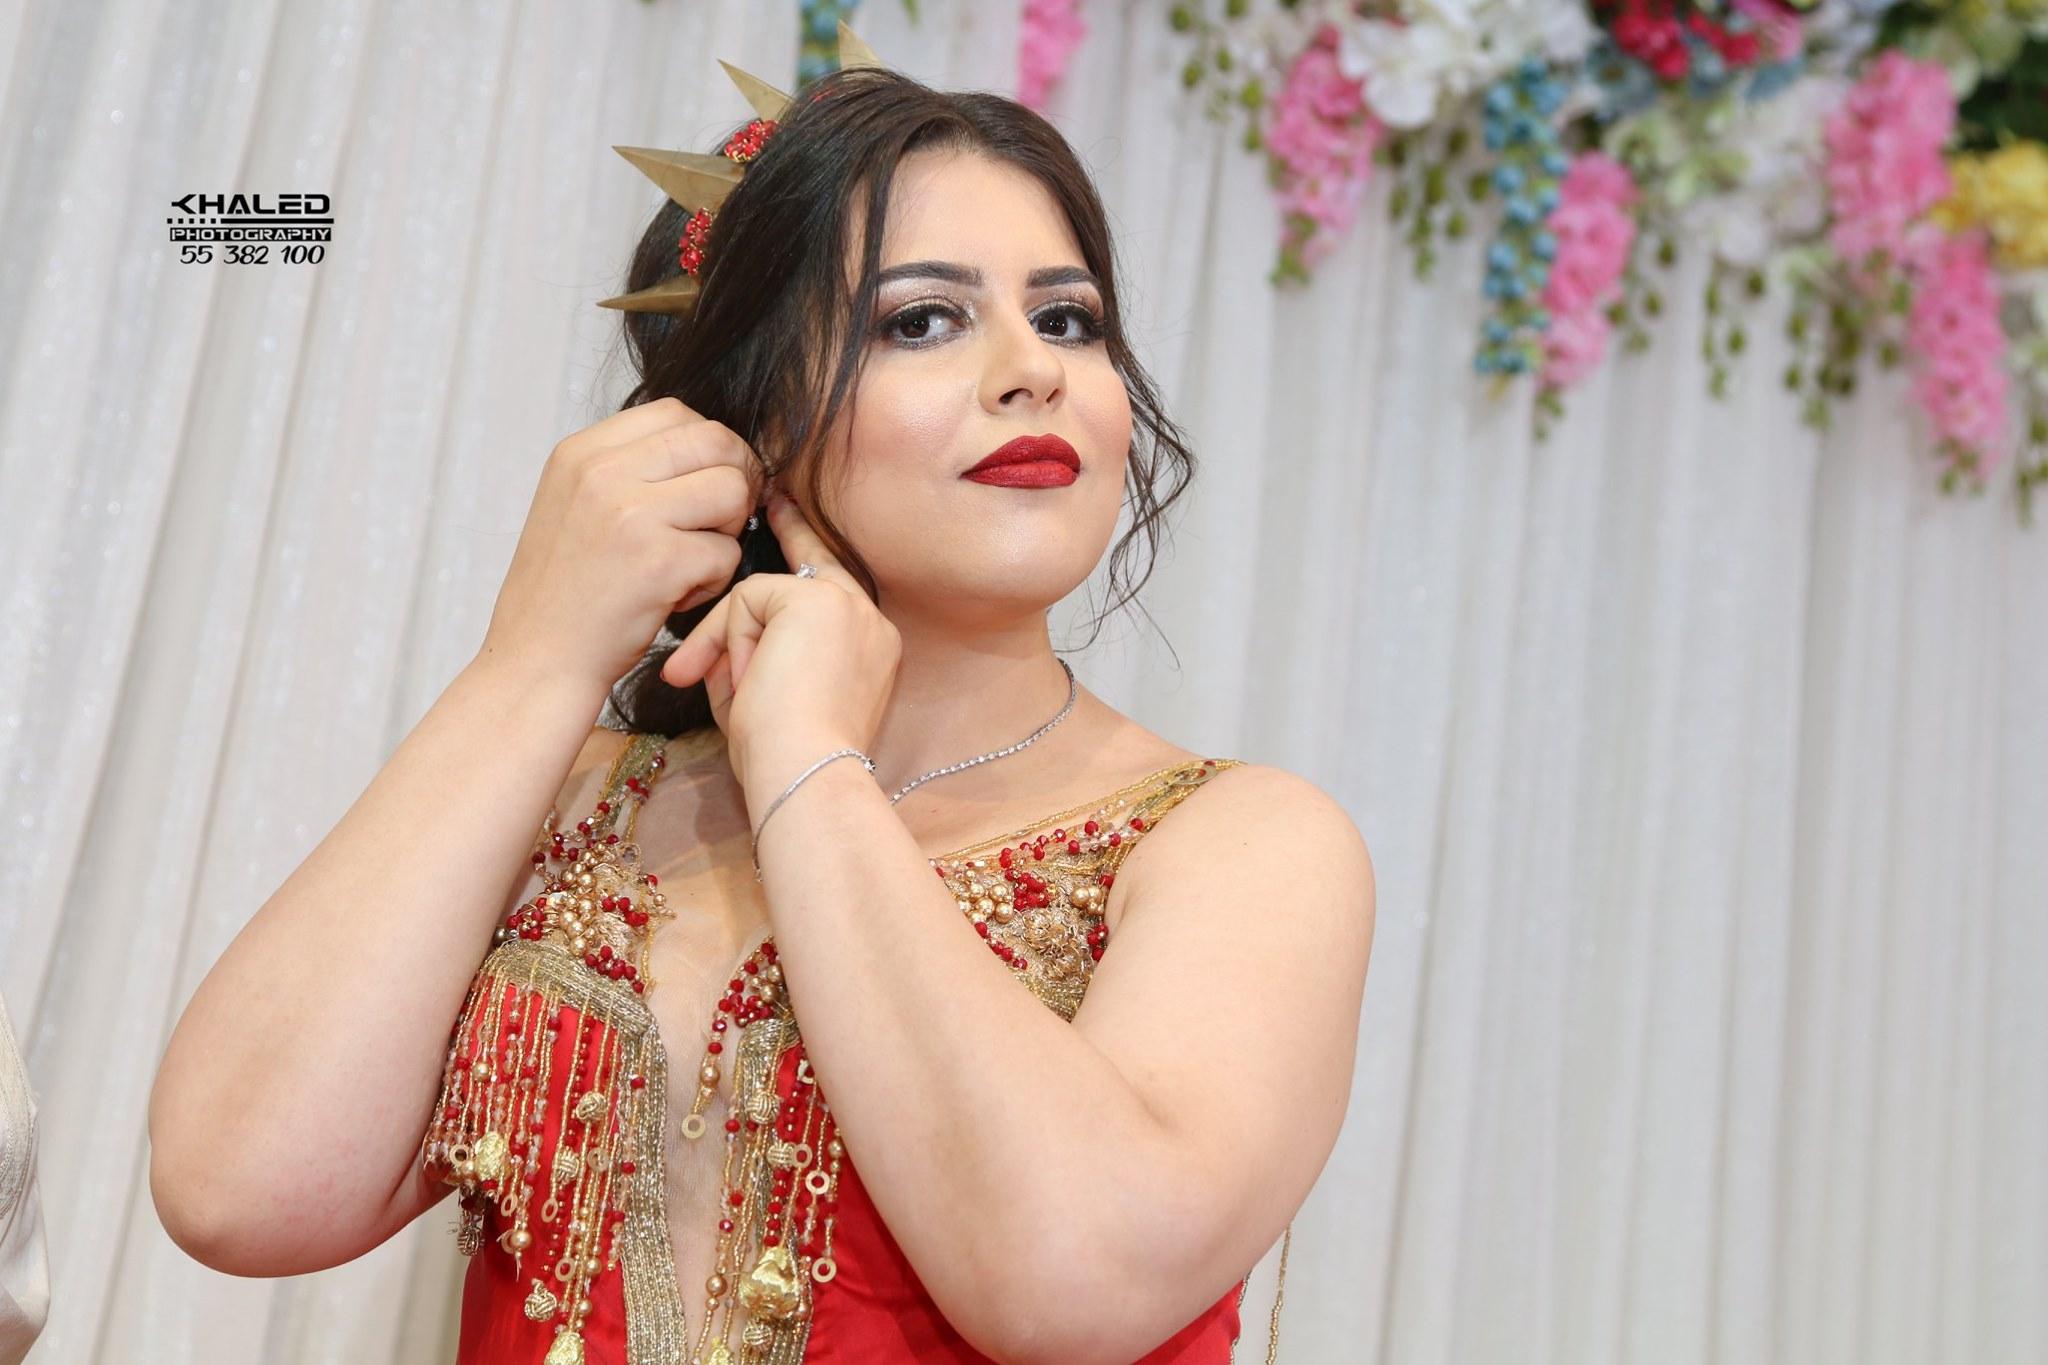 fida35_plus_belles_mariées_tunisiennes_186_2019